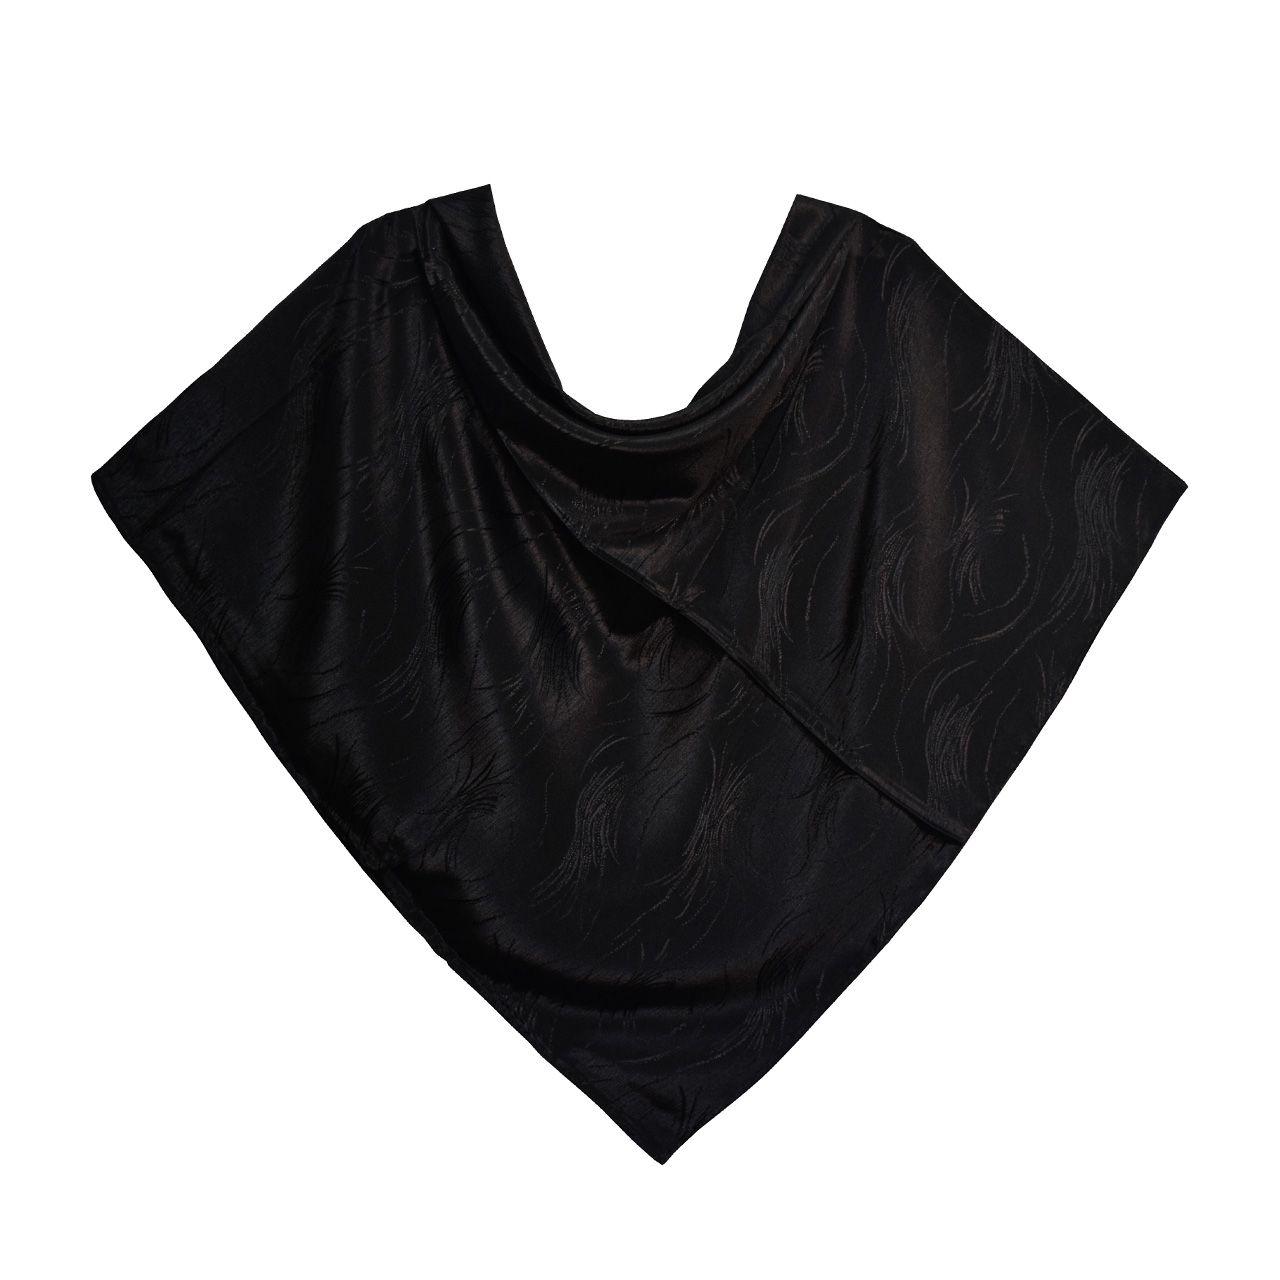 روسری زنانه کد 126 -  - 2